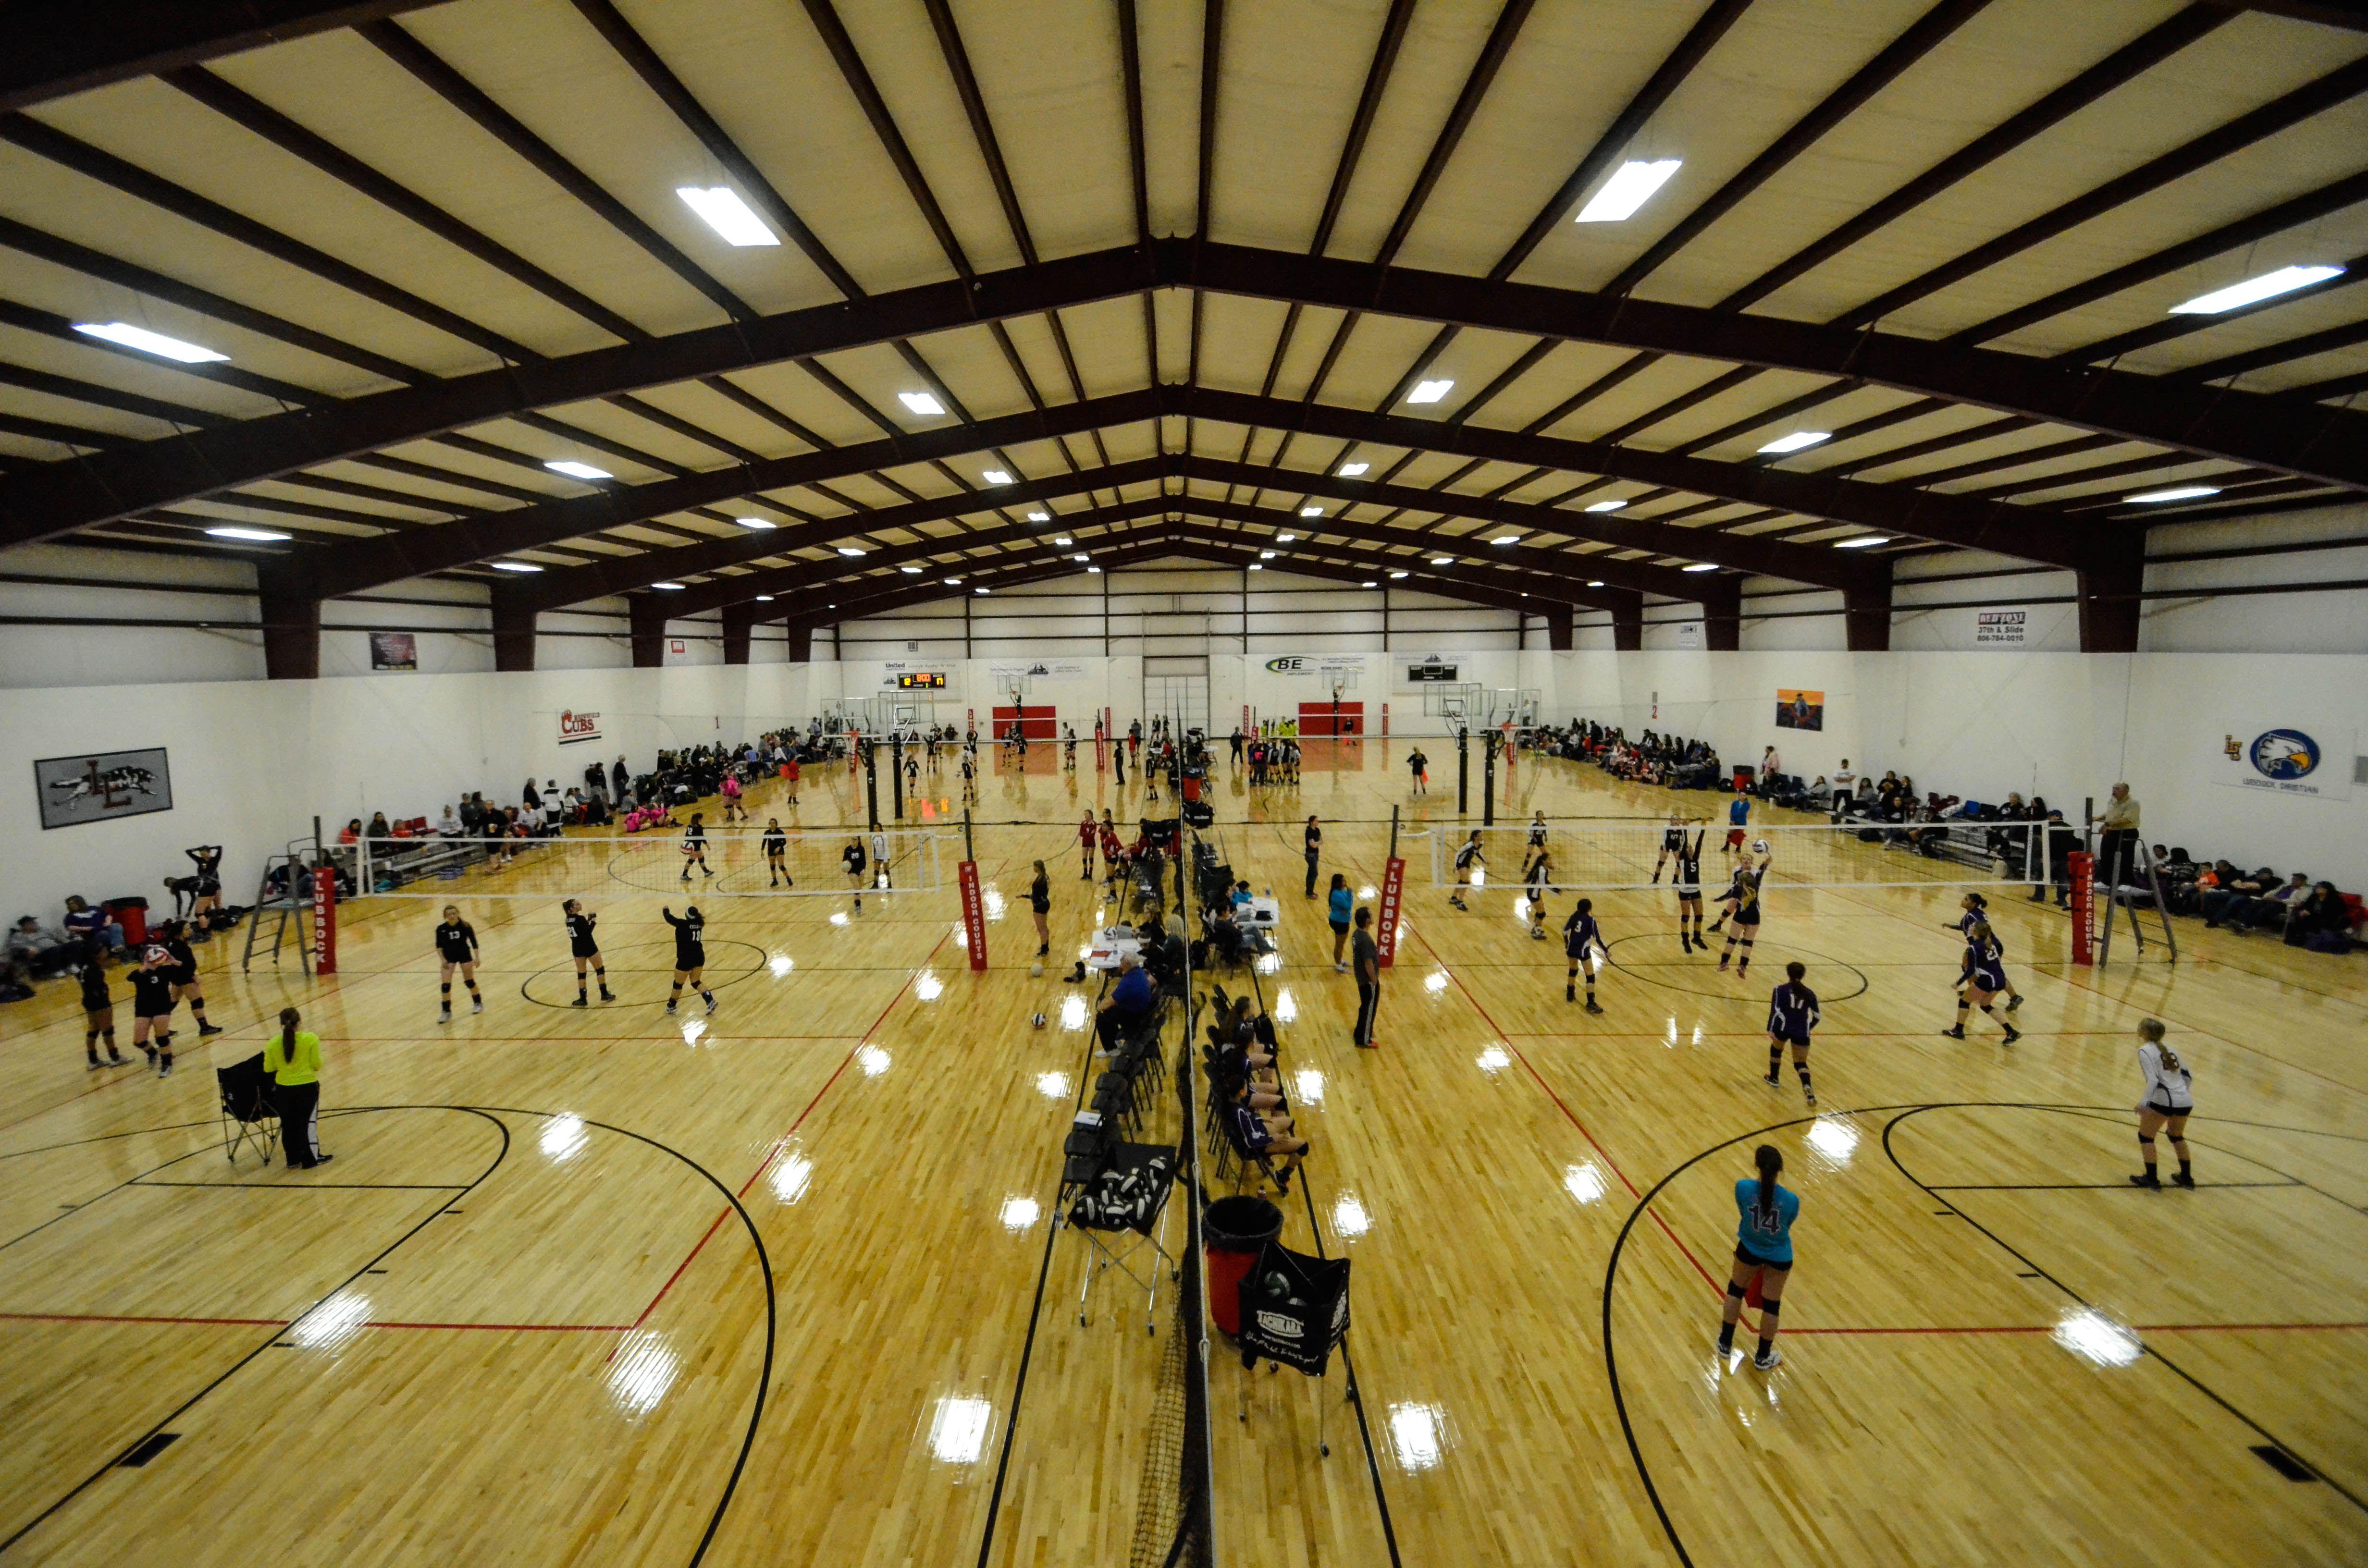 Apex Event Center Is The Ideal Spot For Your Next Gymnastics Event Karate Tournament Or Volleyball And Baske Gymnastics Events Karate Tournaments Event Center